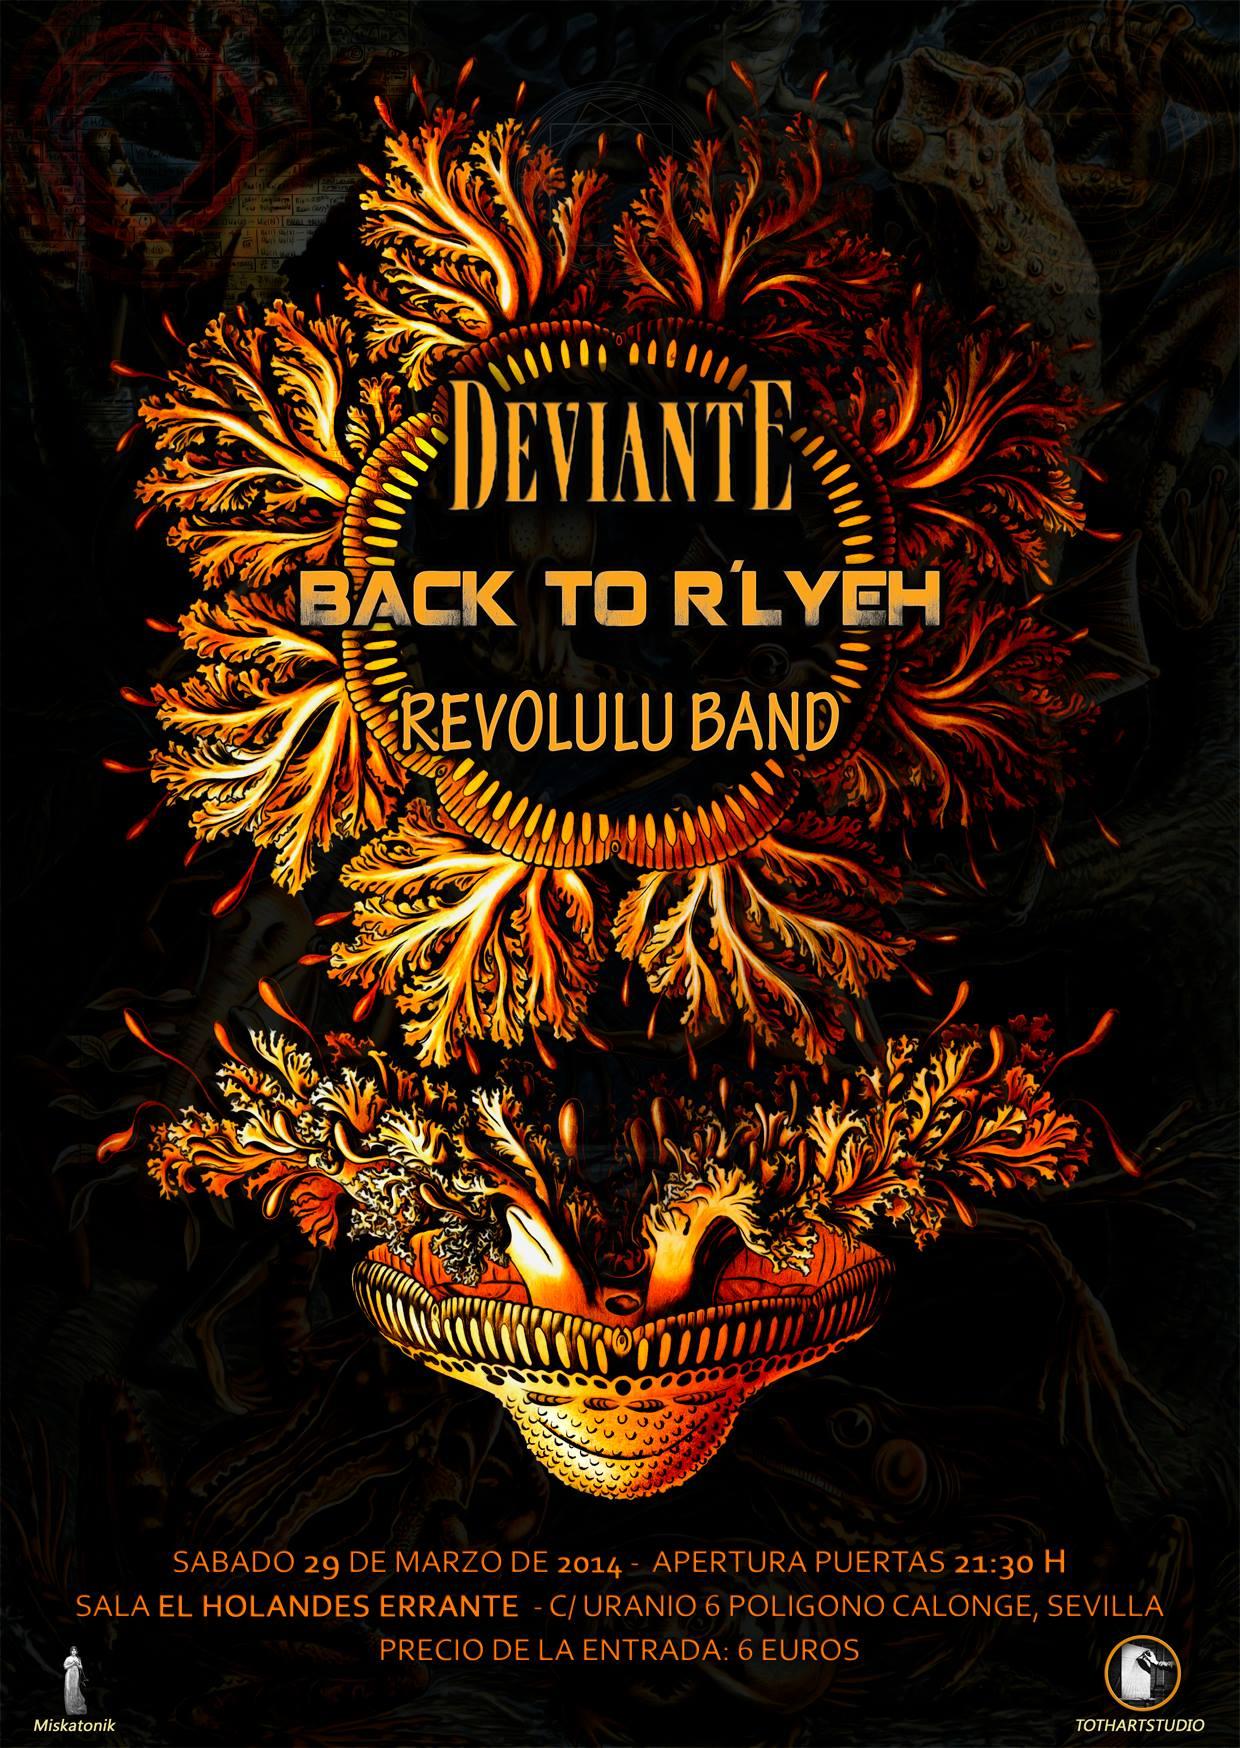 DEVIANTE + BACK TO R'LYEH + REVOLULU BAND – Sevilla – 29/03/14